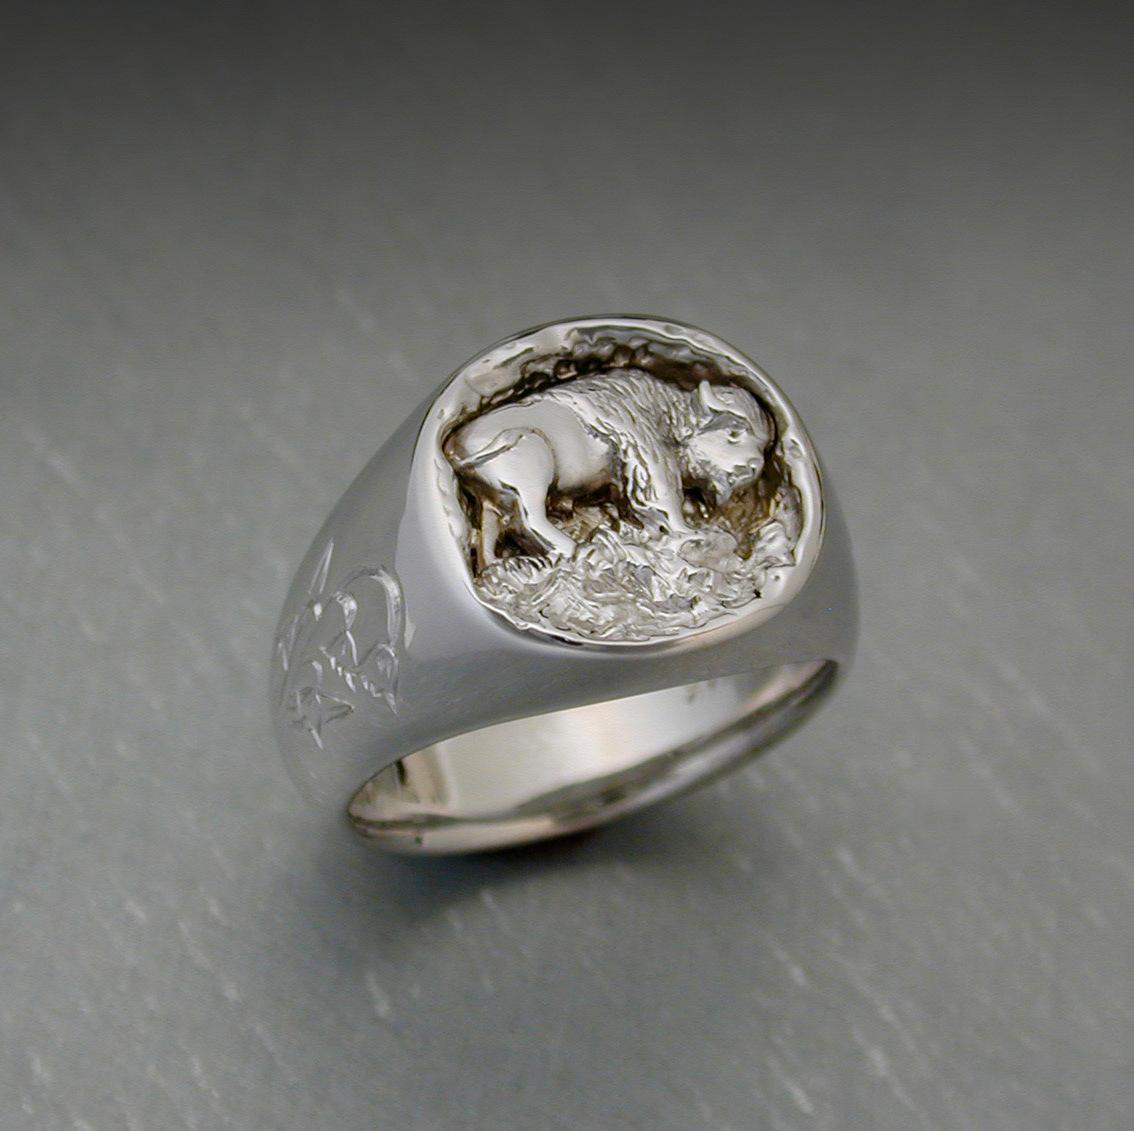 17-bison ring.JPG